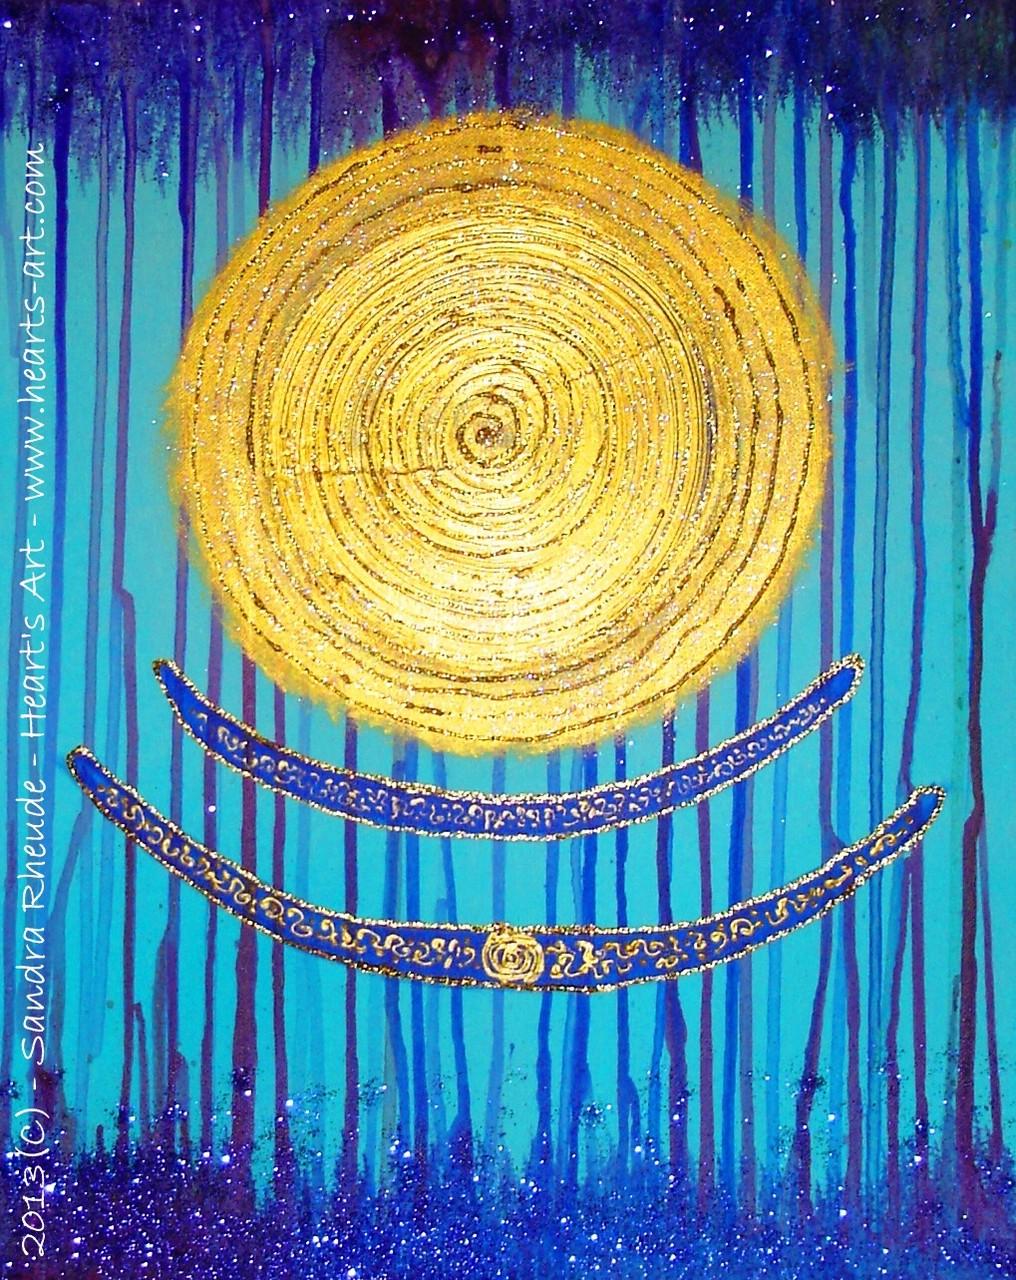 'Vergebung' - 2013/64 - Acryl/MixedMedia auf Leinwand - 40 x 50 cm - verkauft